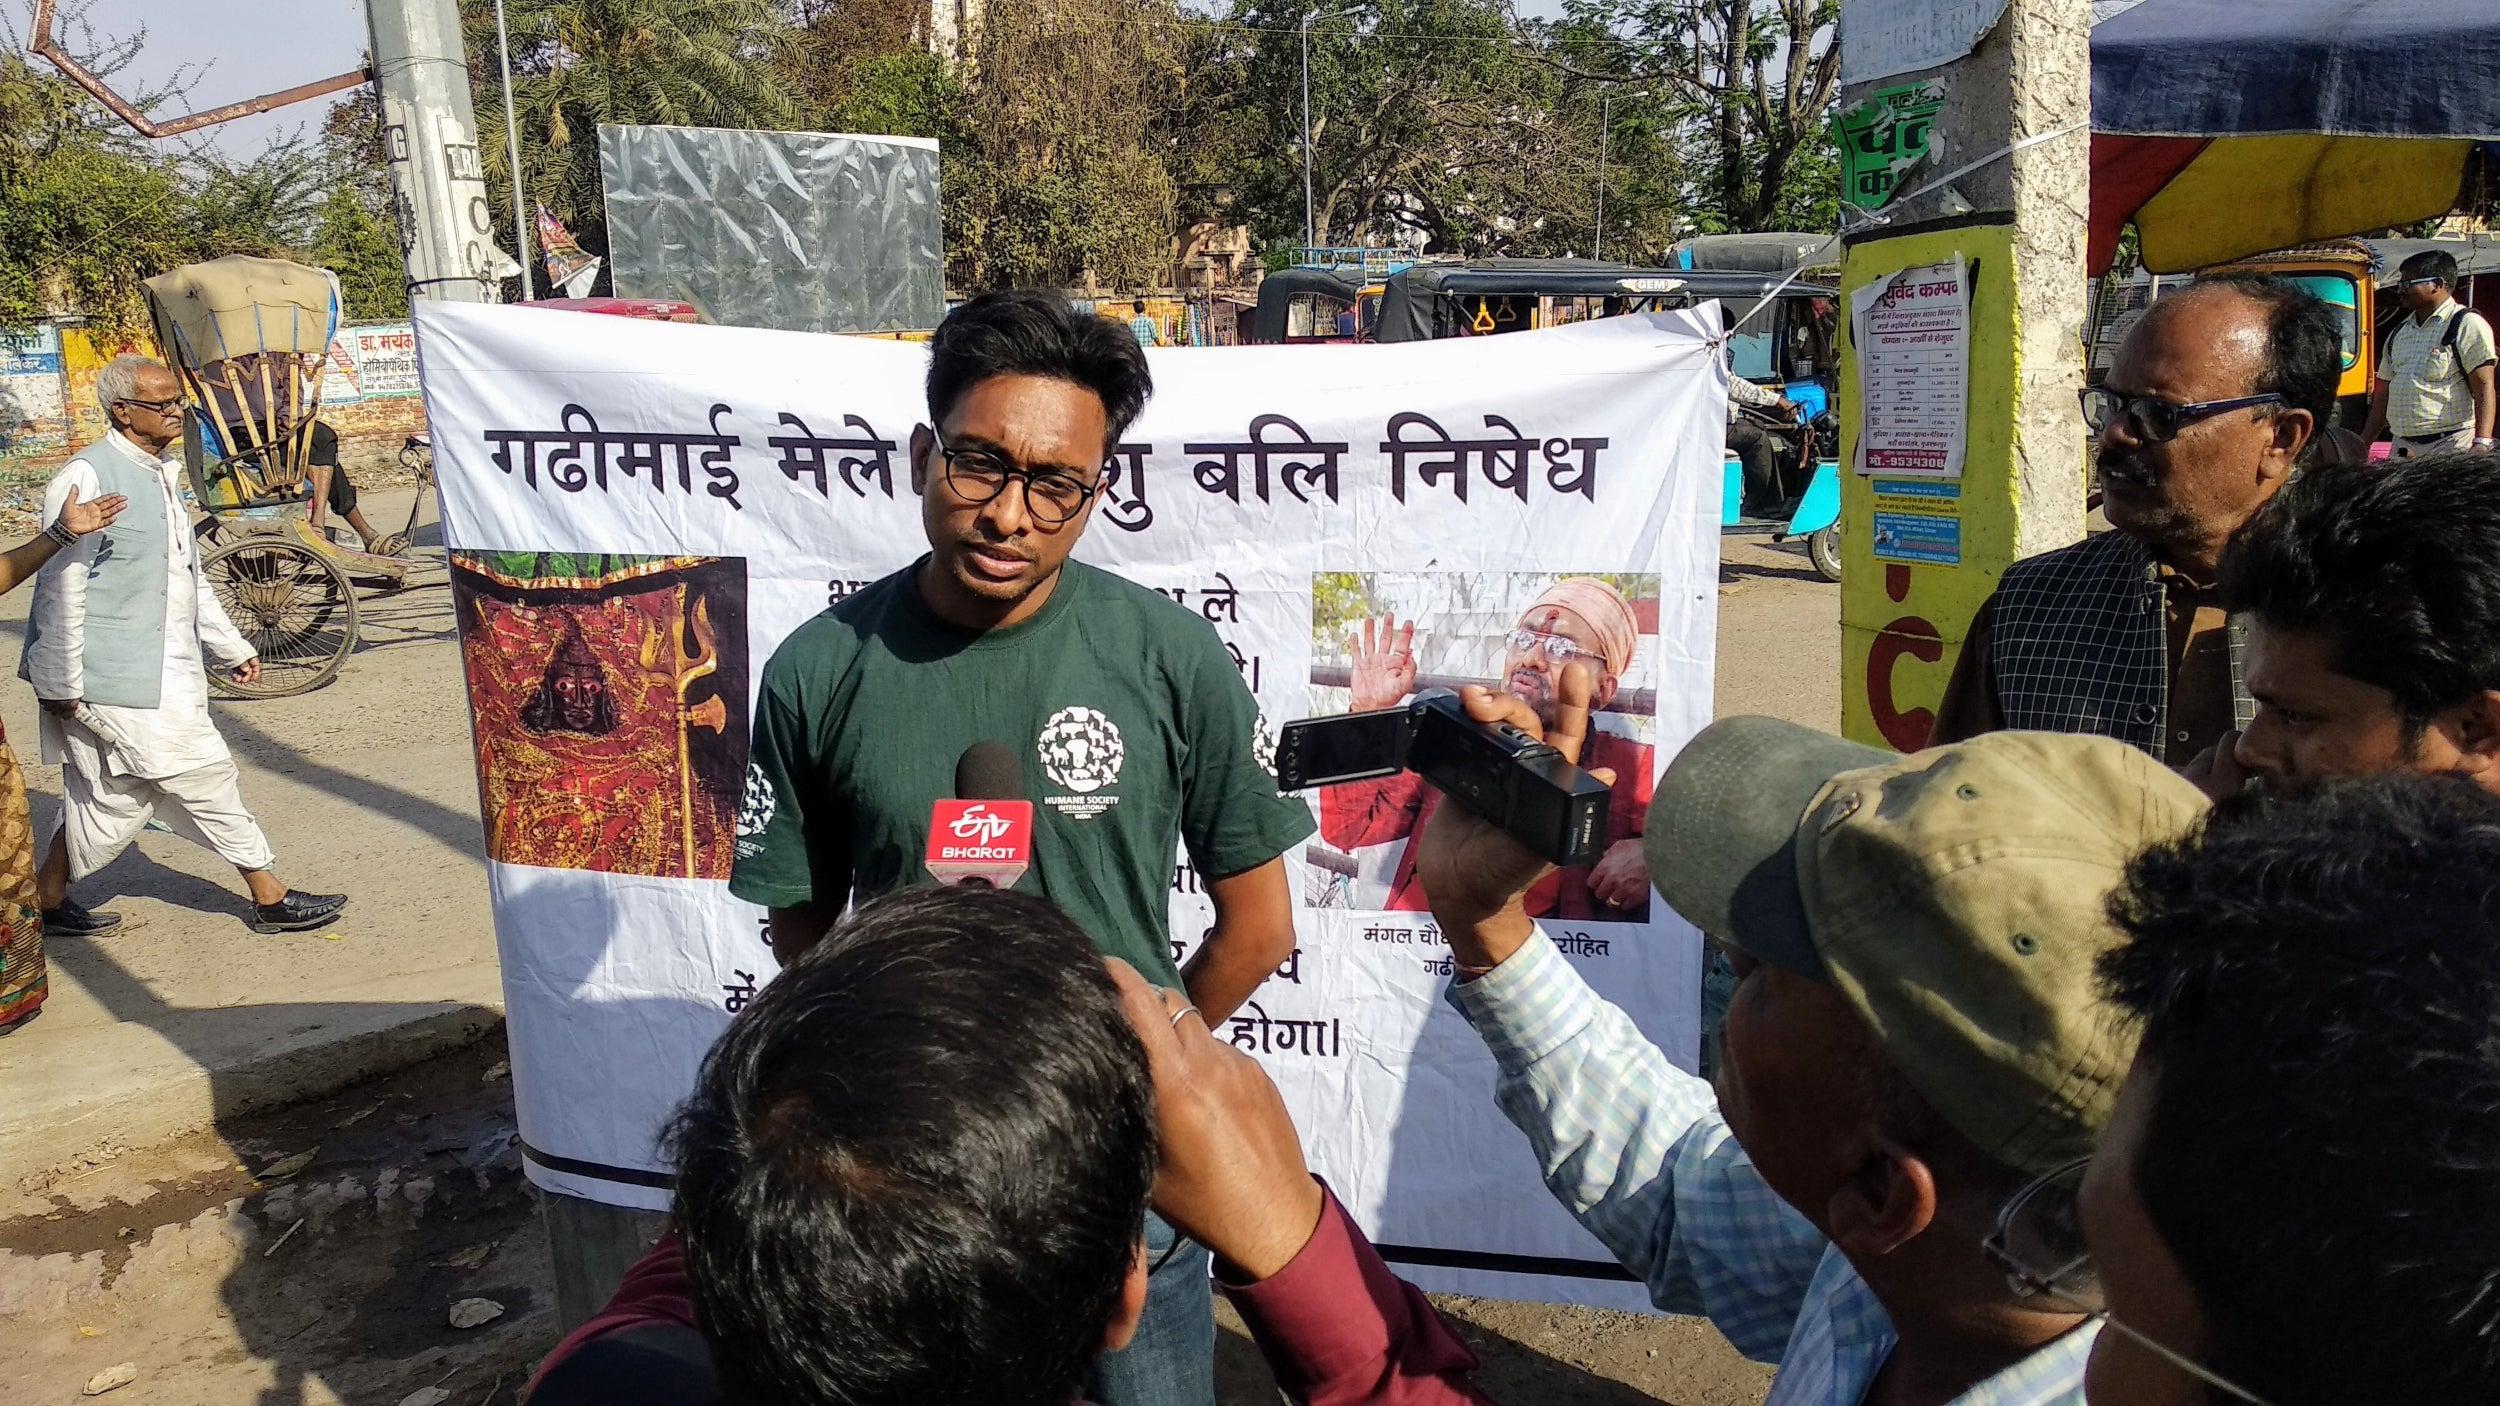 Campaigning against Gadhimai sacrifice